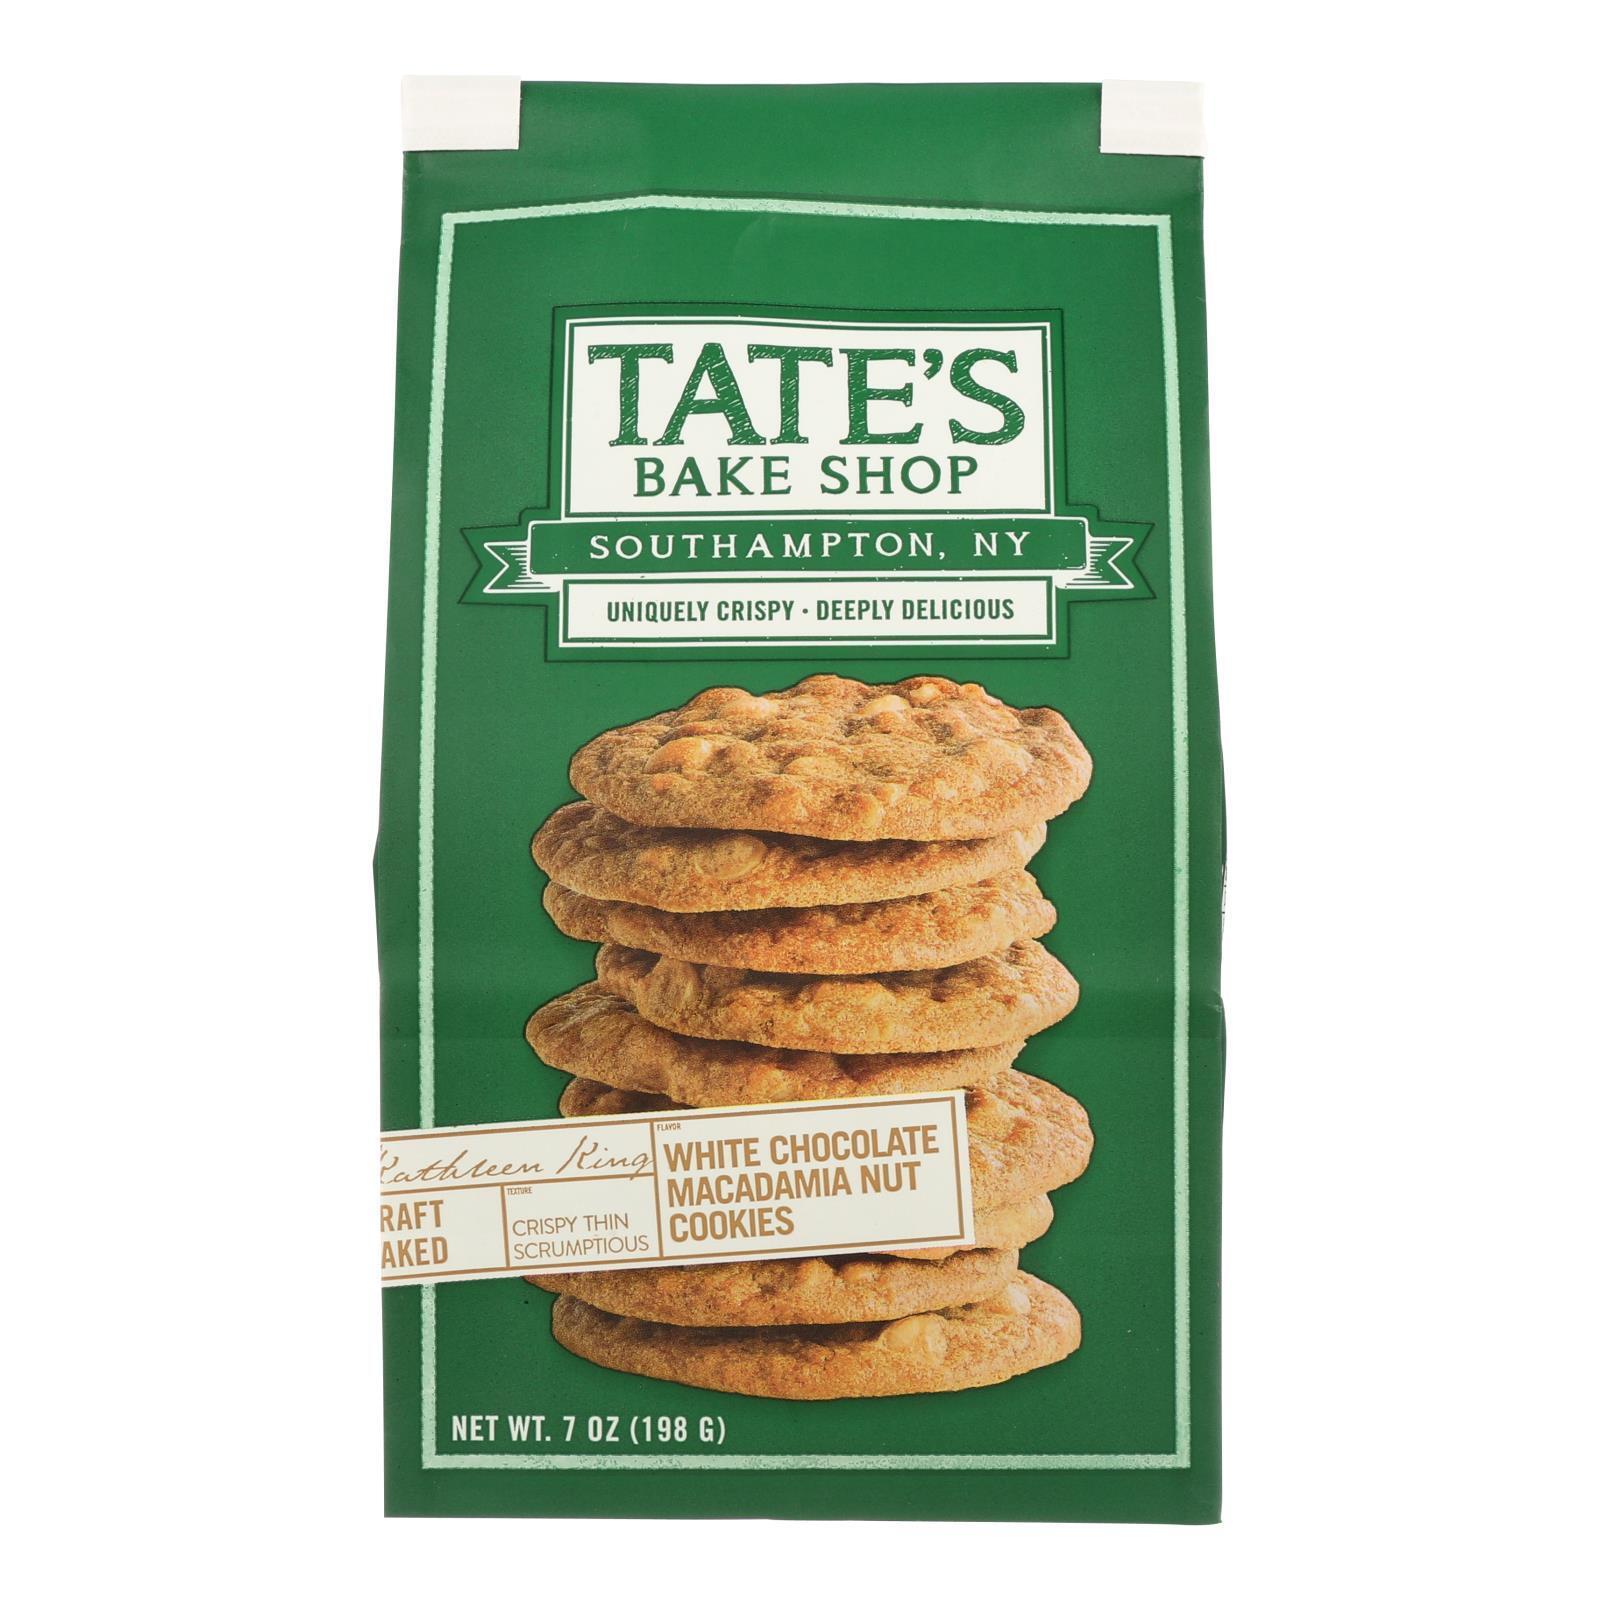 Tate's Bake Shop White Chocolate Macadamia Nut Cookies - Case of 12 - 7 oz.